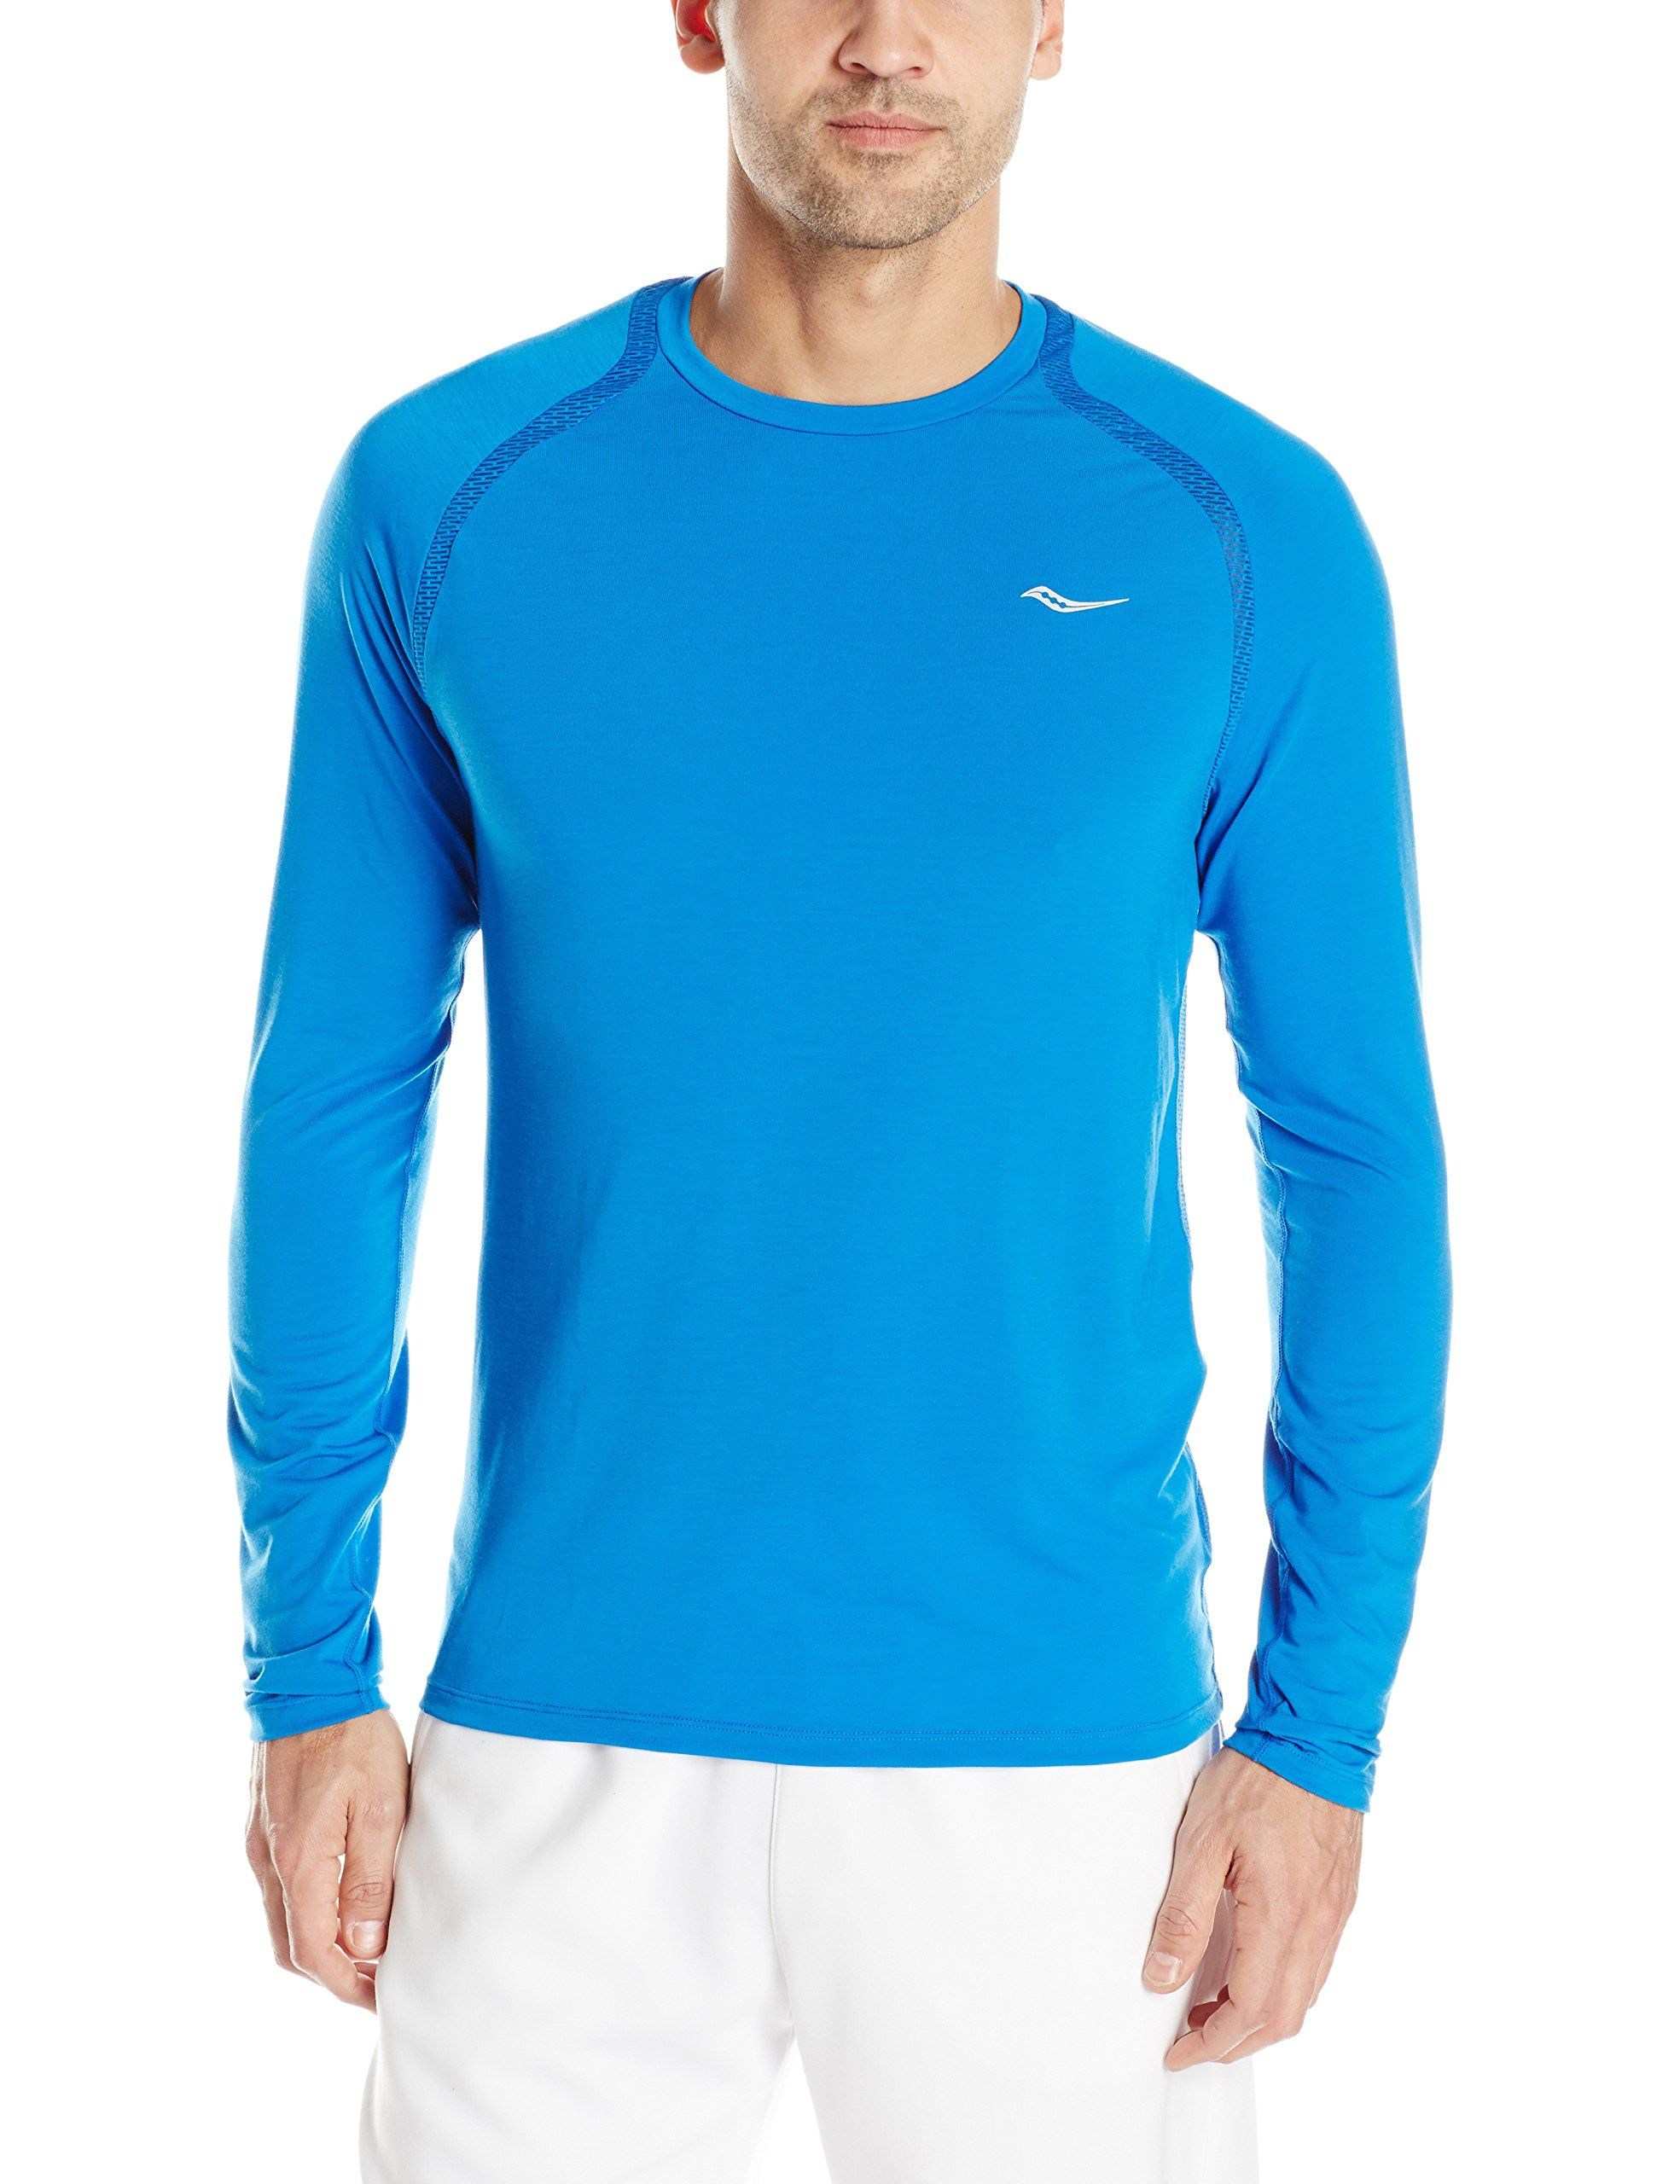 a8734679 Saucony Men's Freedom Long Sleeve Top, Medium, Aero Blue. Innovative ...